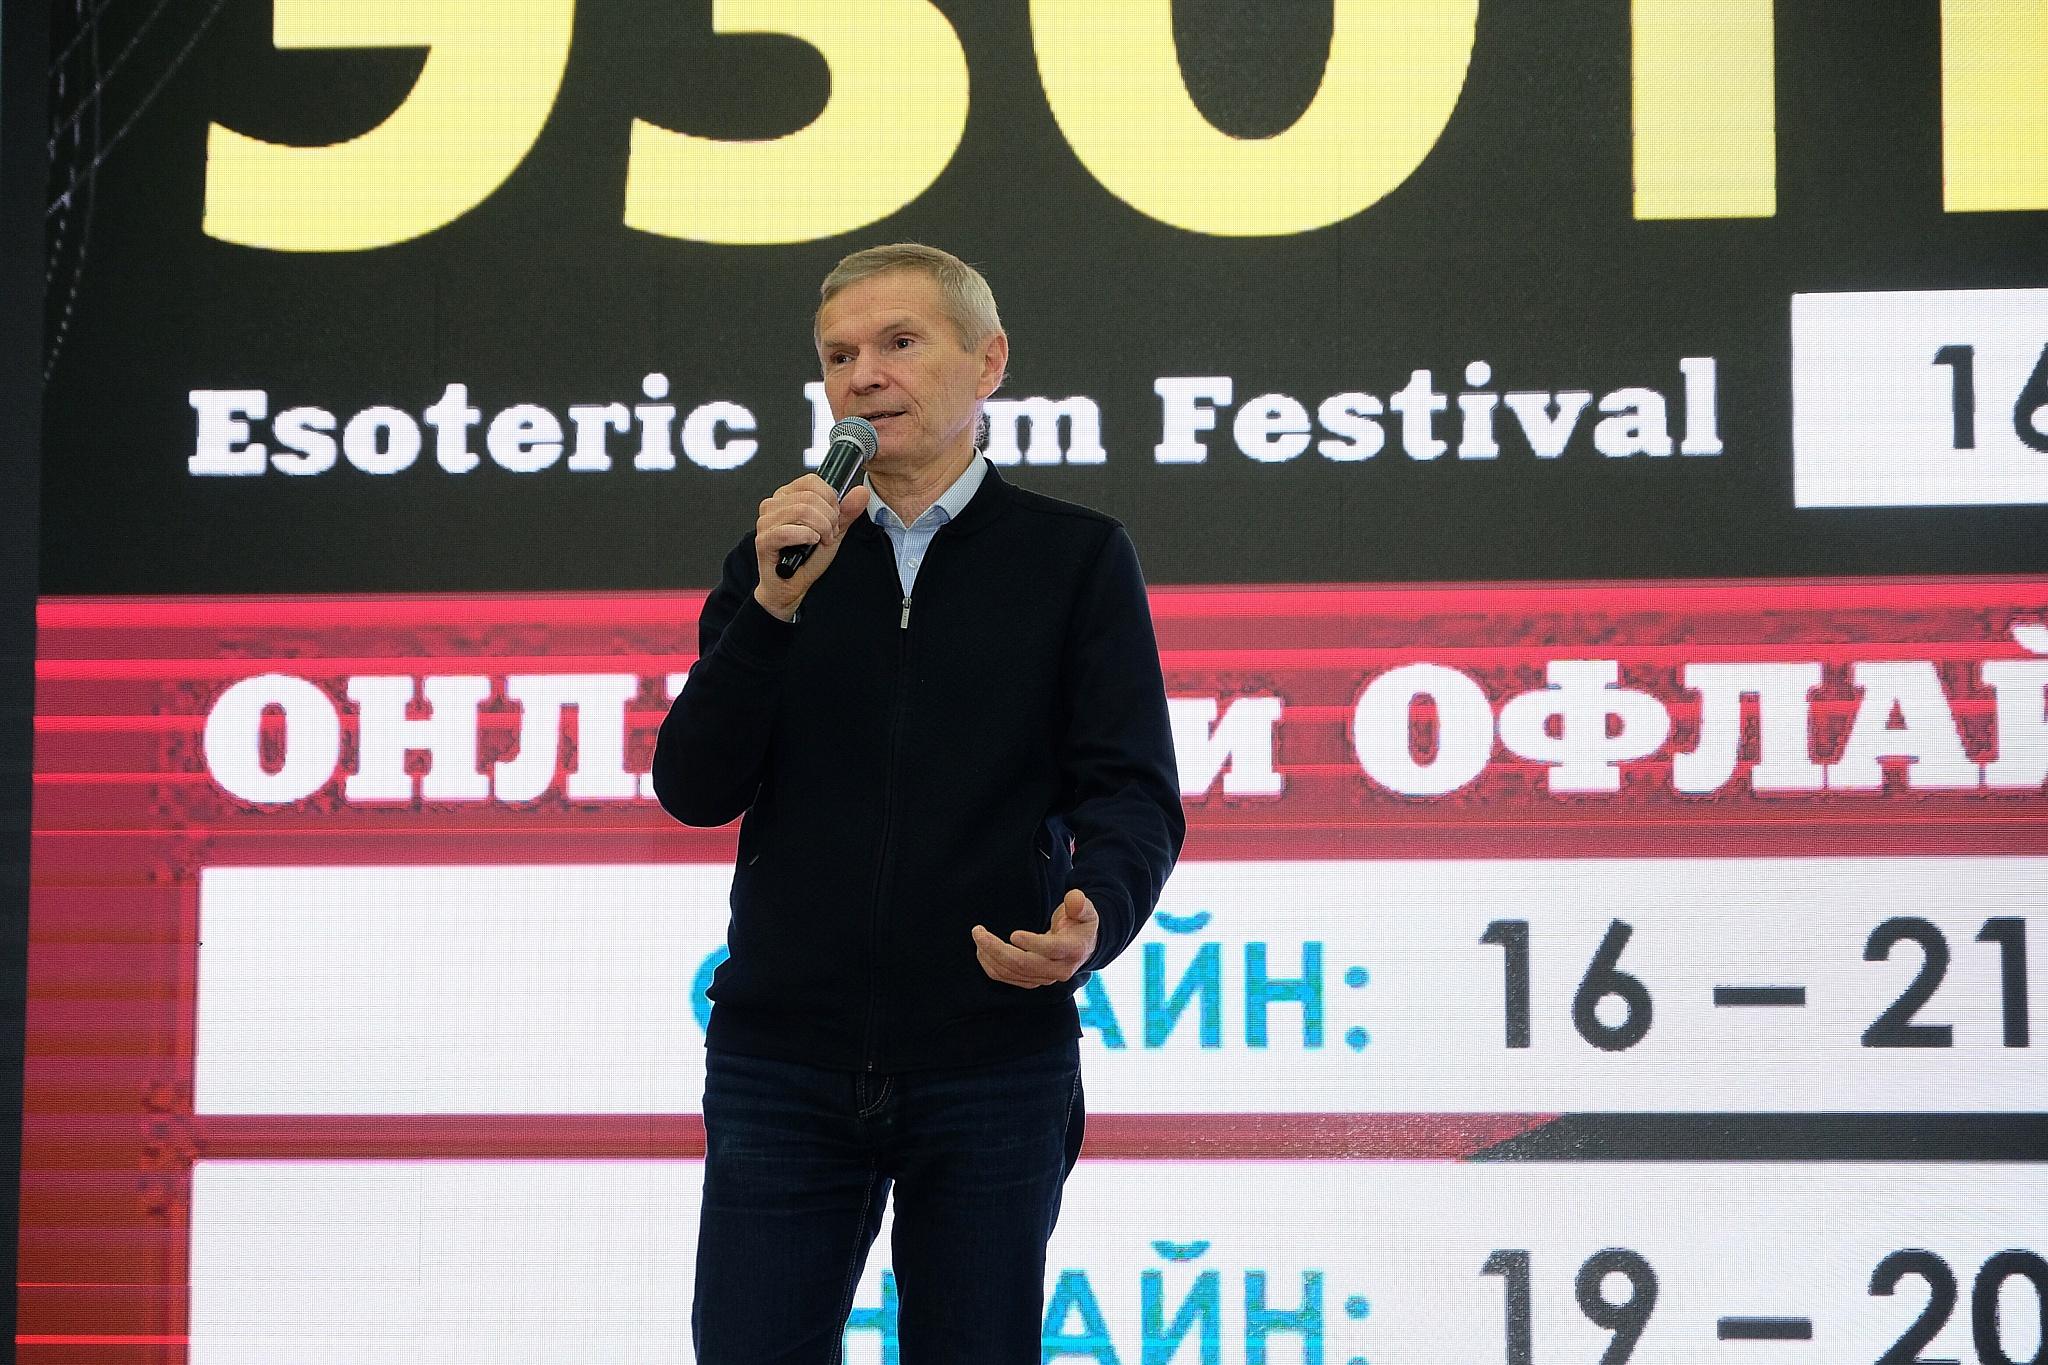 Организатор фестиваля Валерий Шанин